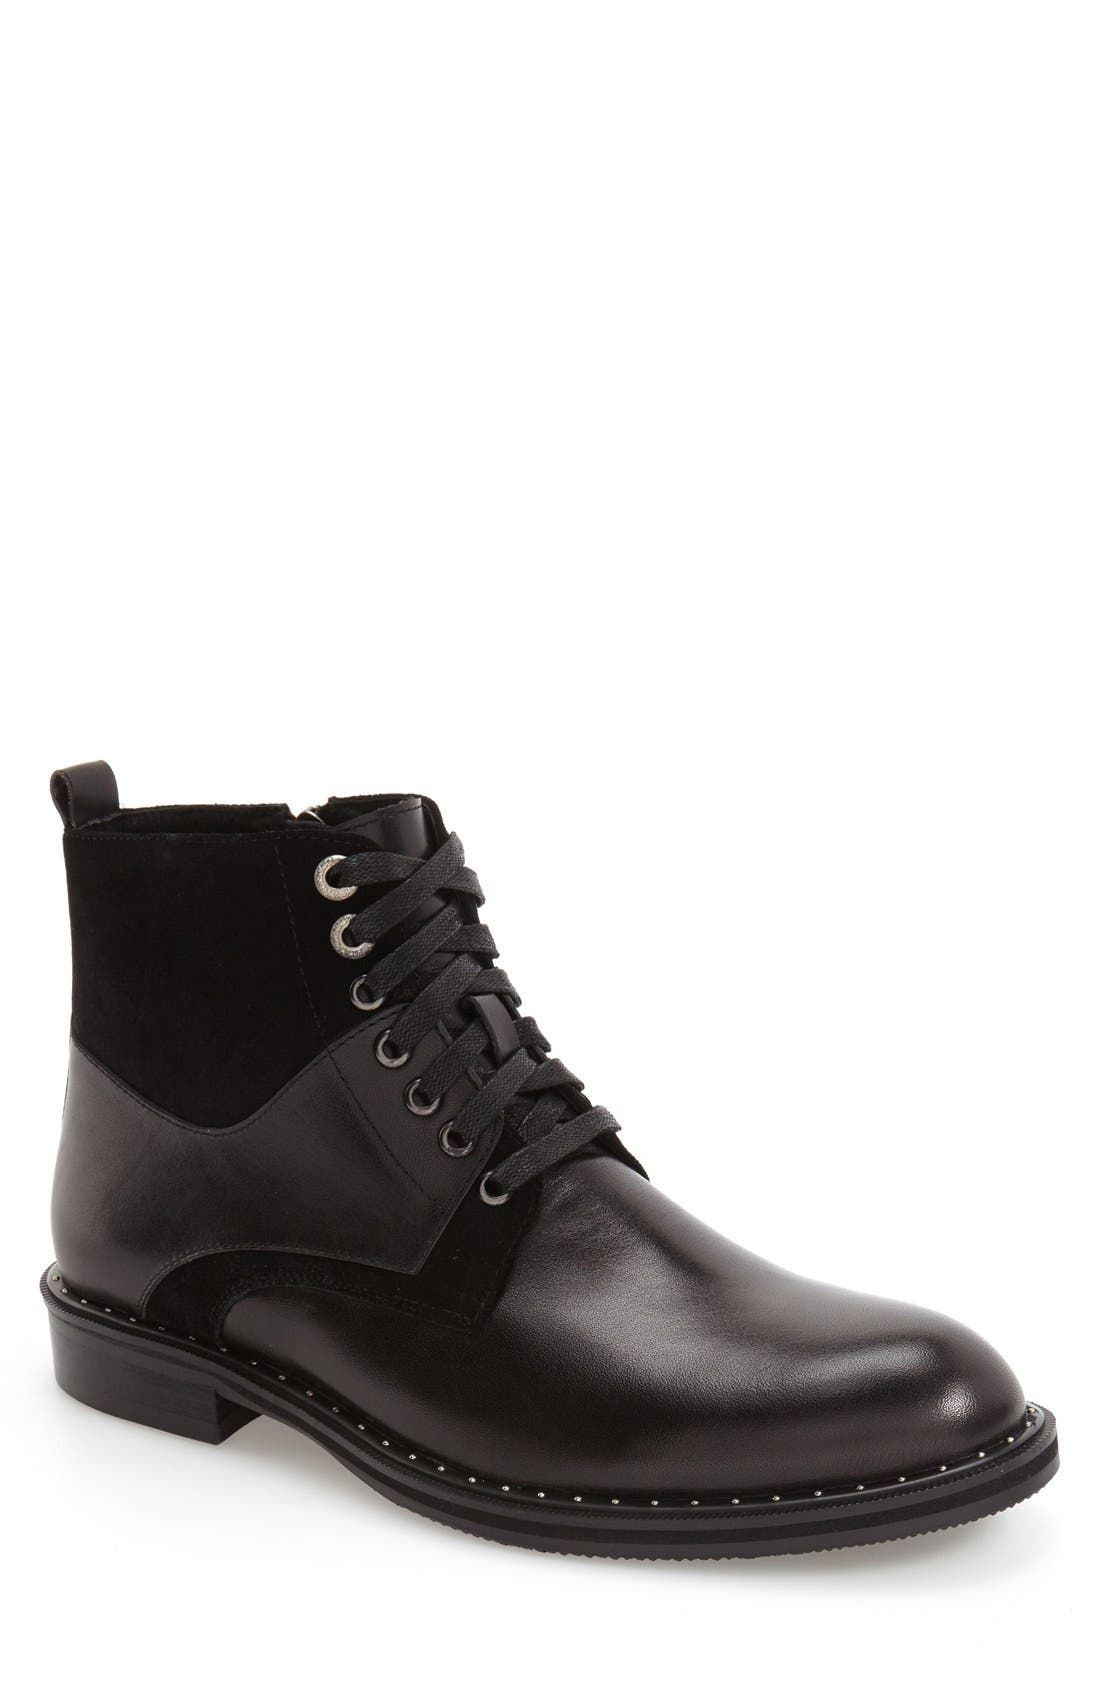 'Verona' Midi Studded Boot,                         Main,                         color, Black